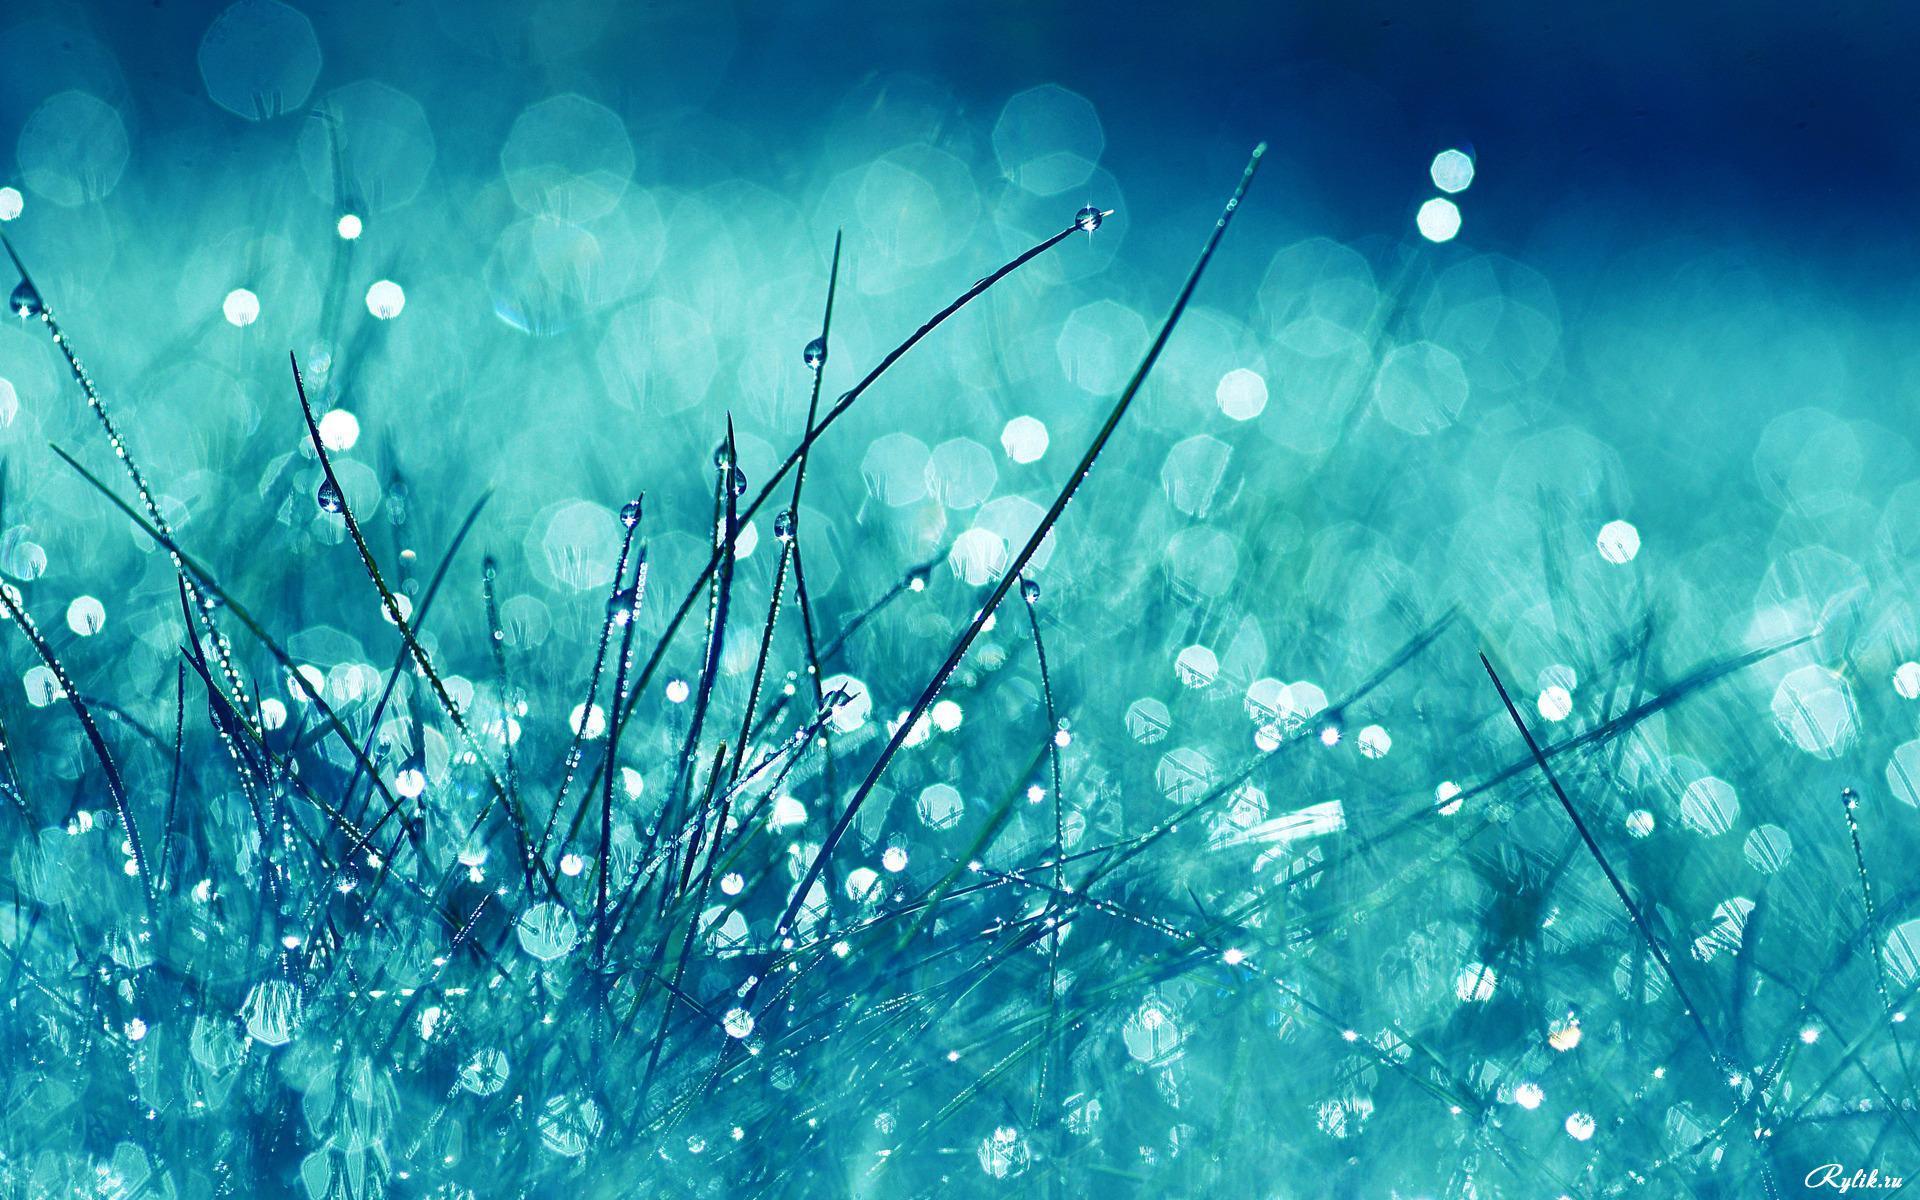 Blue Dew On The Grass - Blue Dew On The Grass